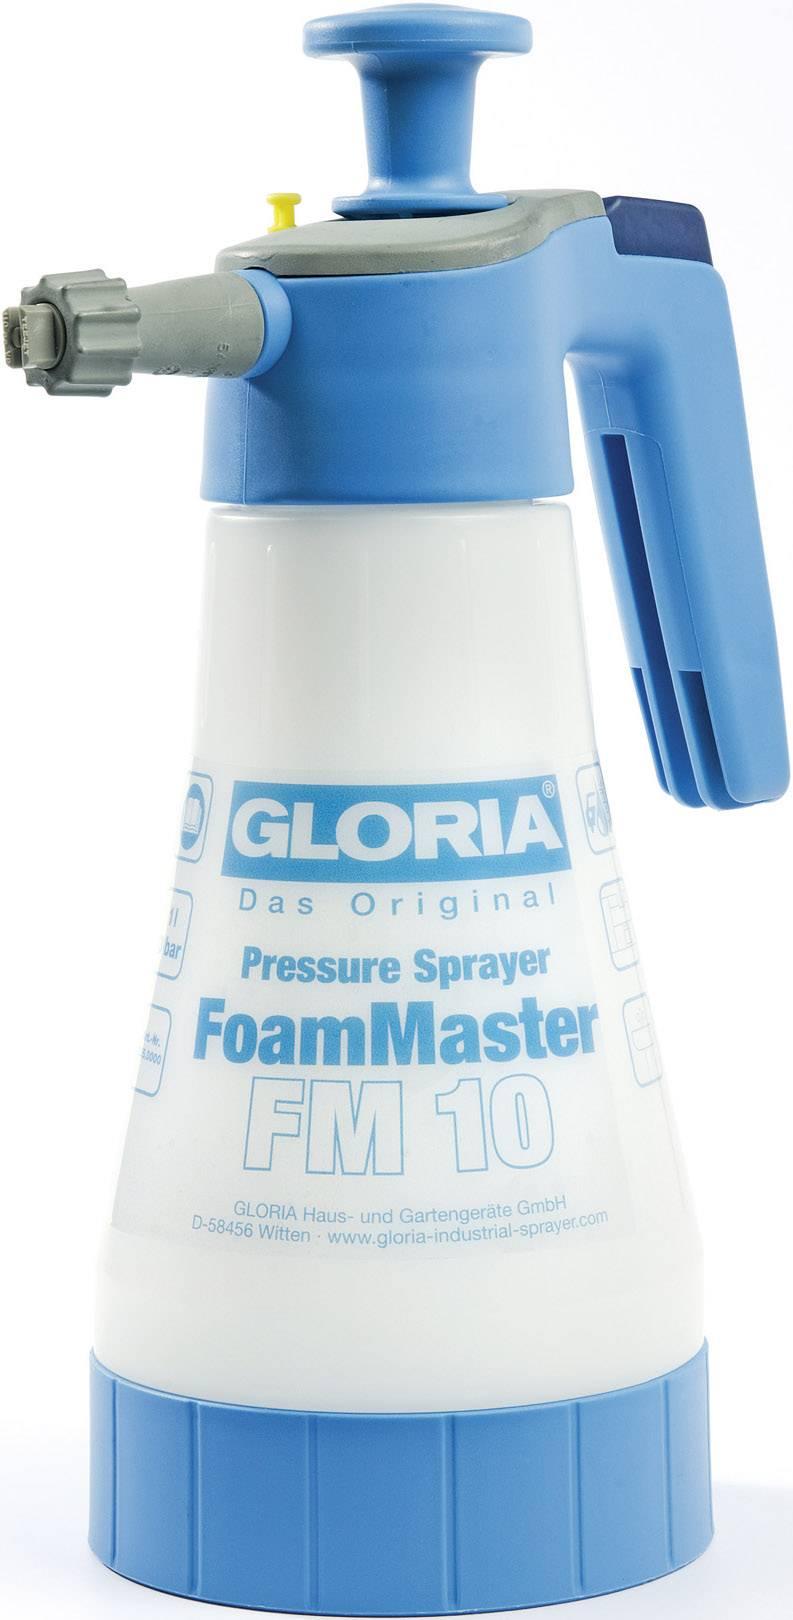 Tlakový rozprašovač Gloria Haus und Garten 000655.0000, FoamMaster FM 10, 1 l